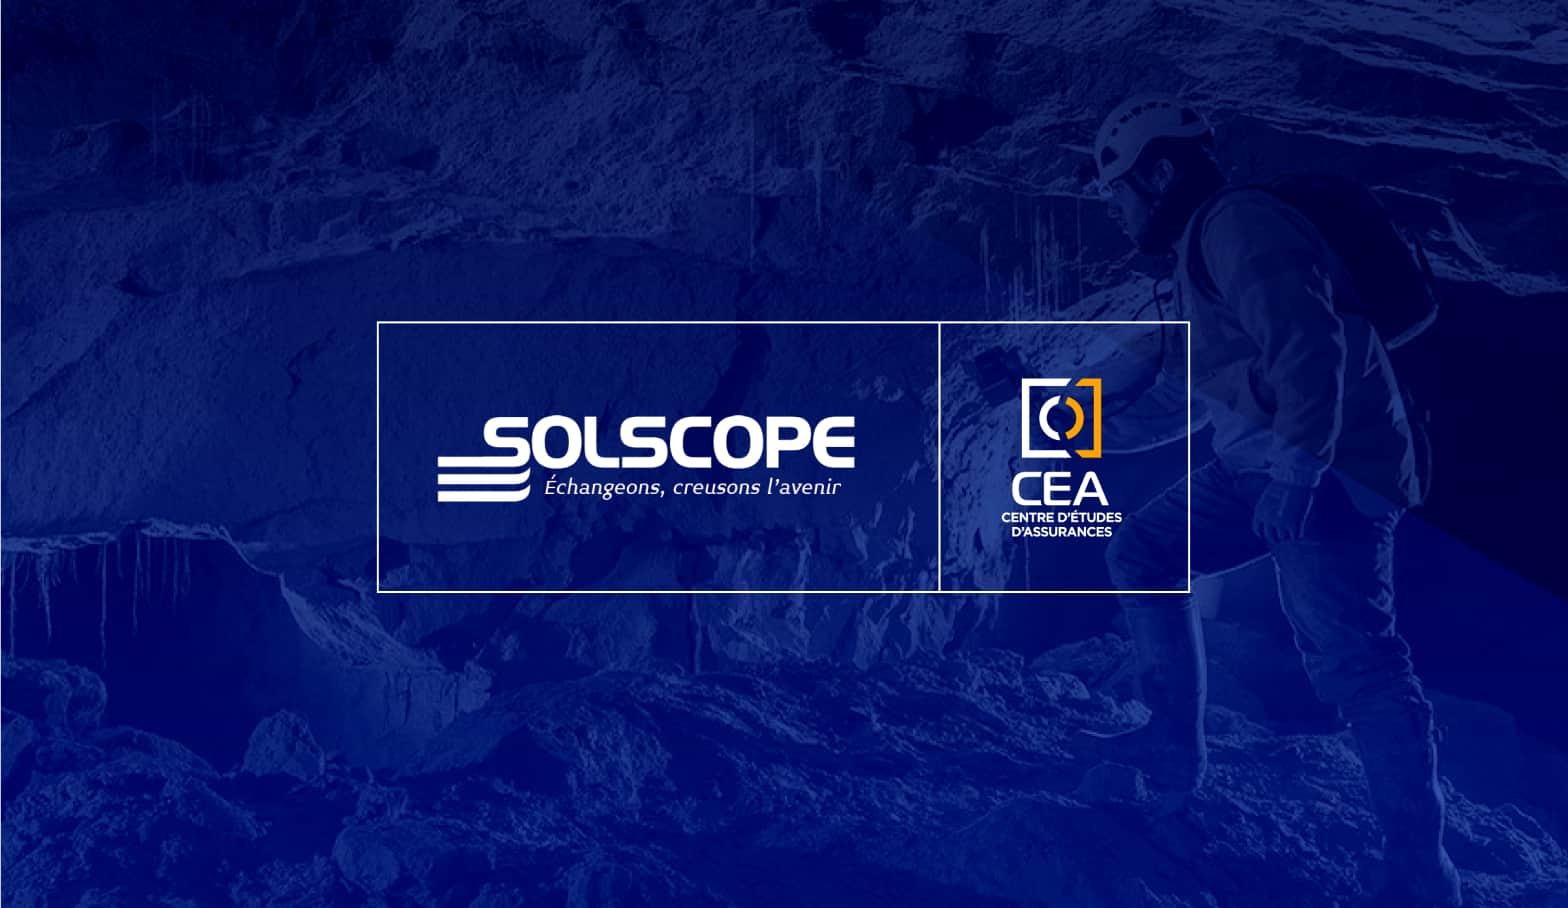 Banner_Sloscope